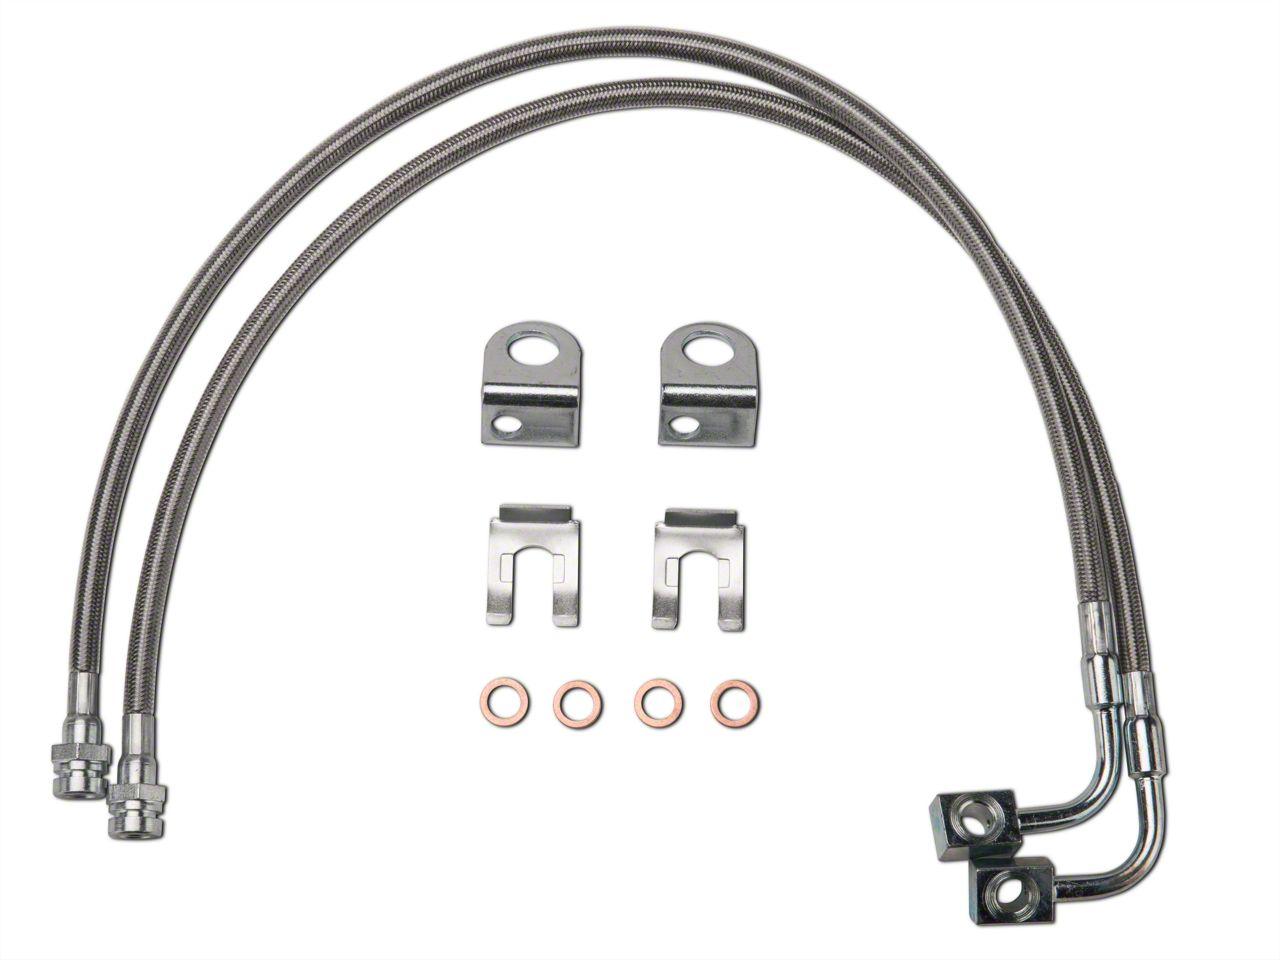 Jeep Wrangler 4 0 Engine Upgrades moreover 5 9 Cummins Fuel Line Diagram together with Pentastar 3 6 Engine Sensor Locations additionally  on jk engine swap